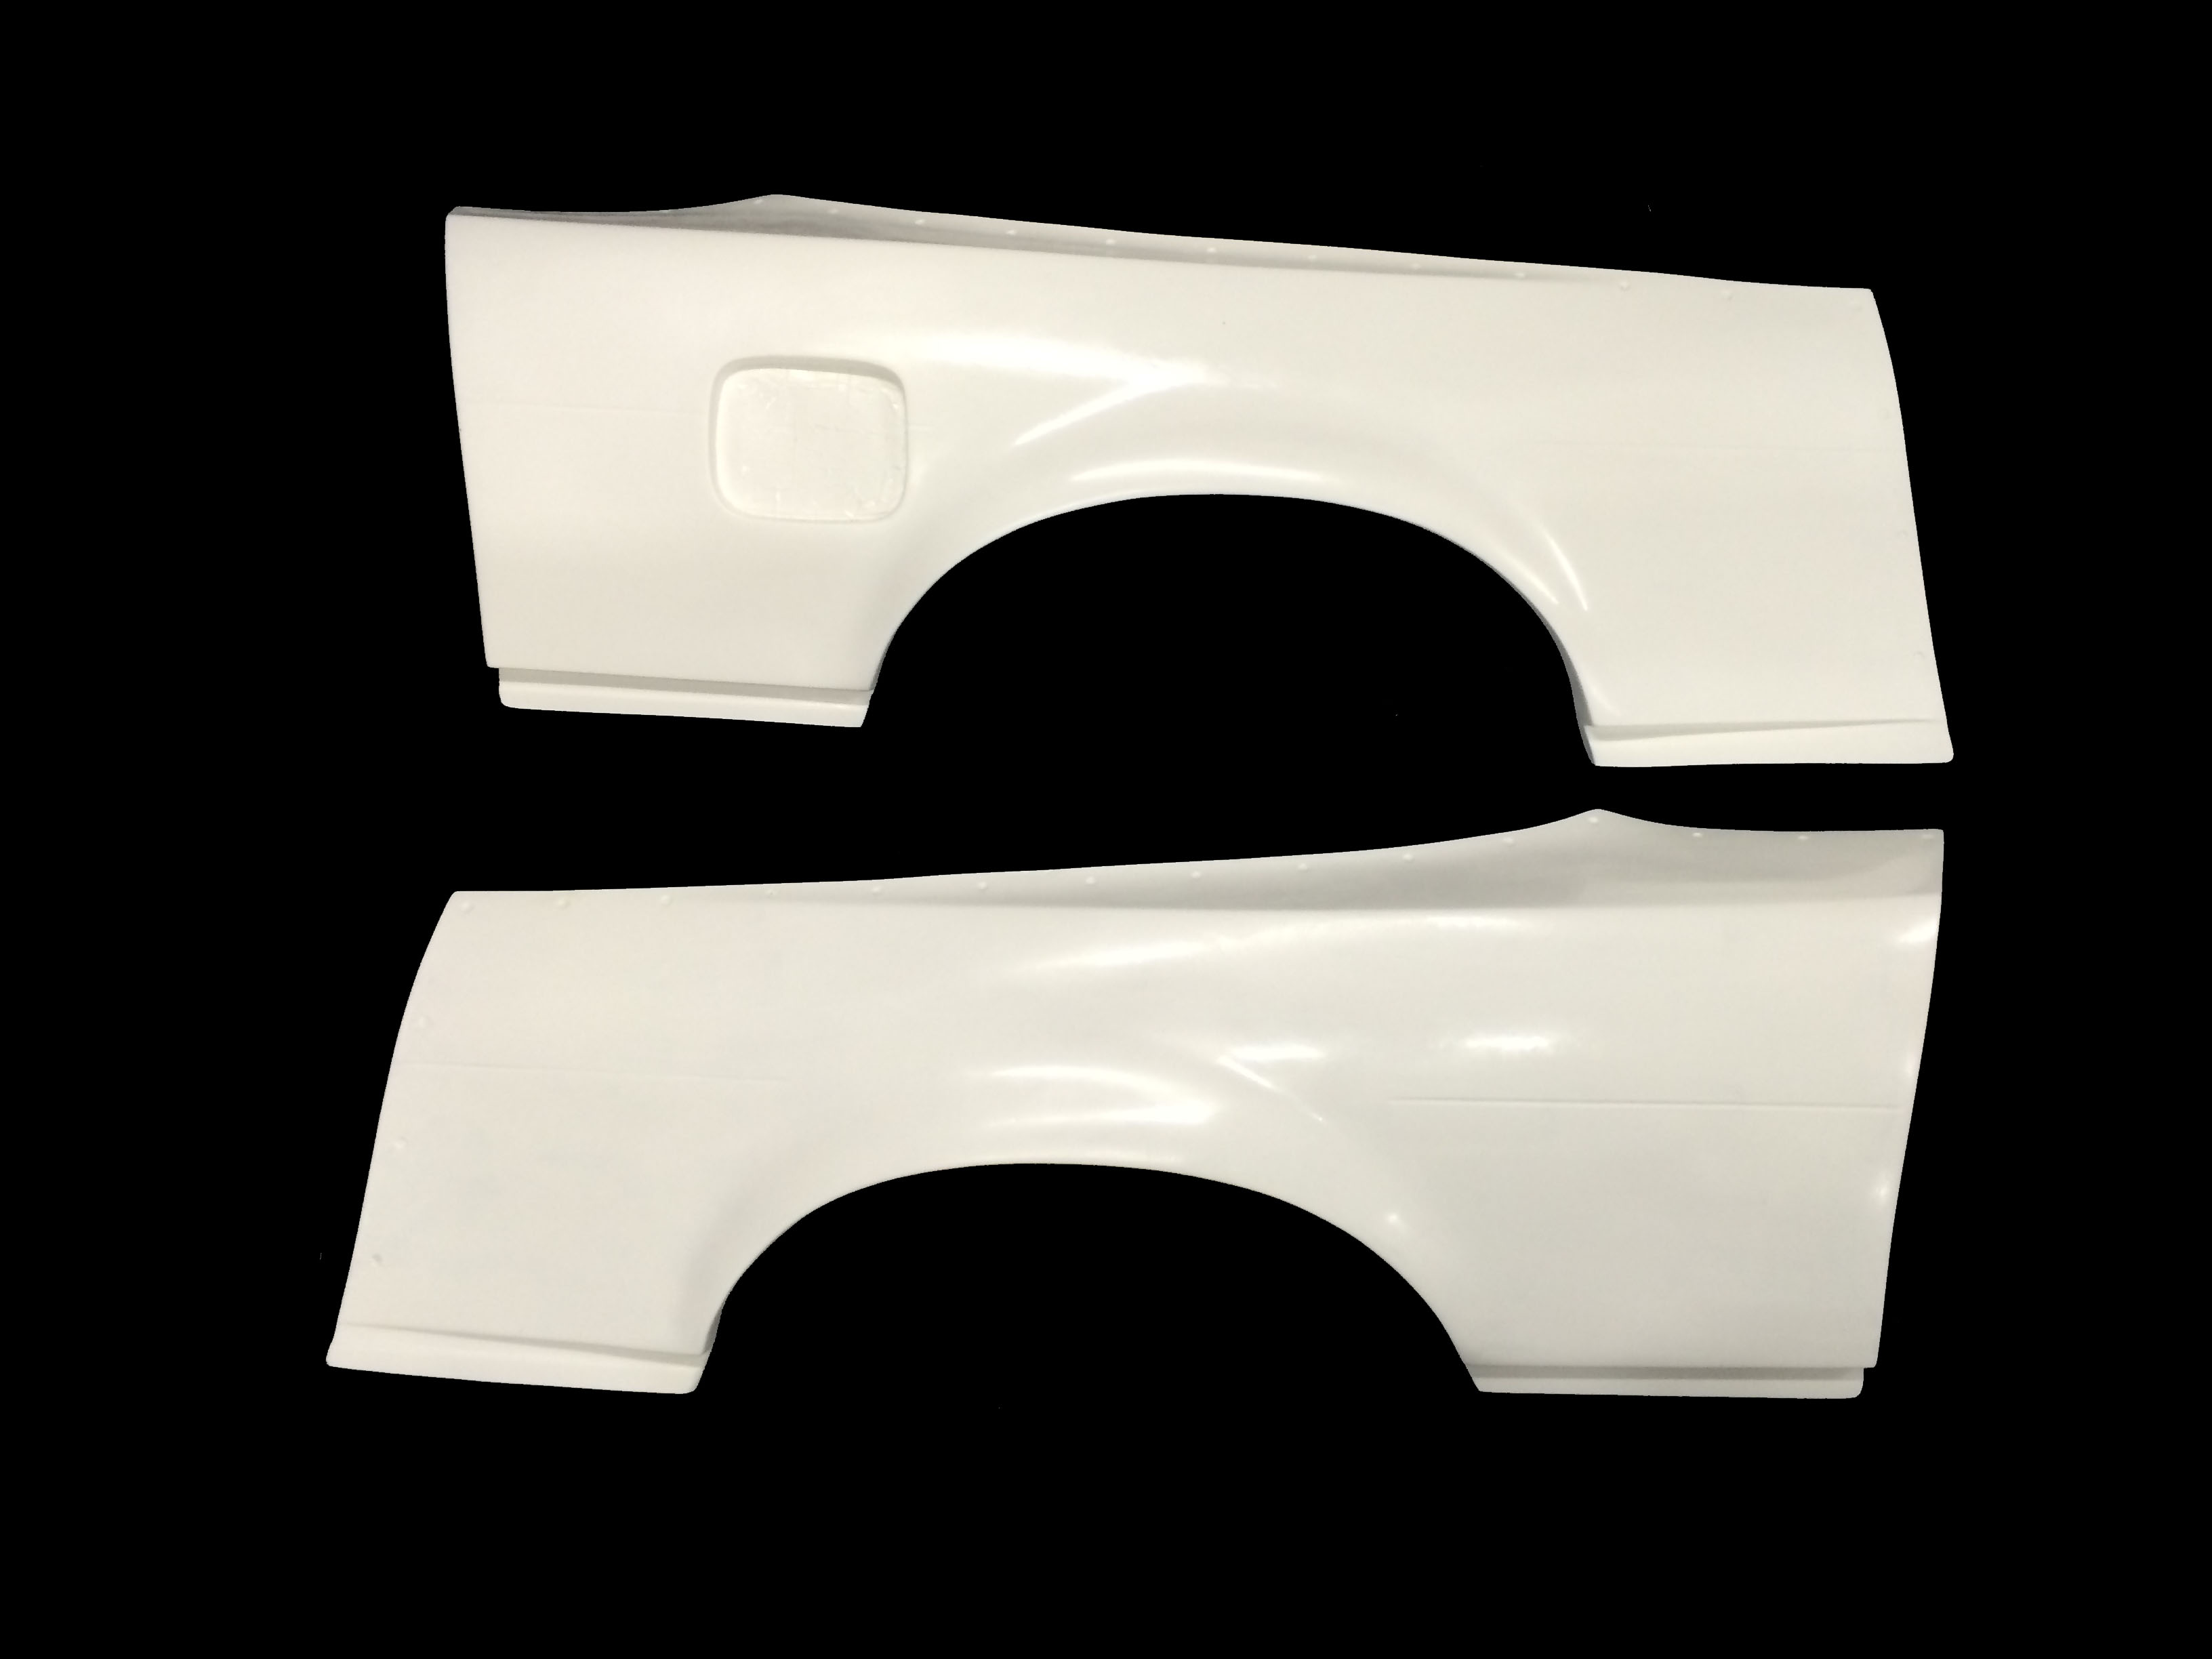 Kinzuru Kits Nissan S13 Koguchi Power Style Overfenders +70mm